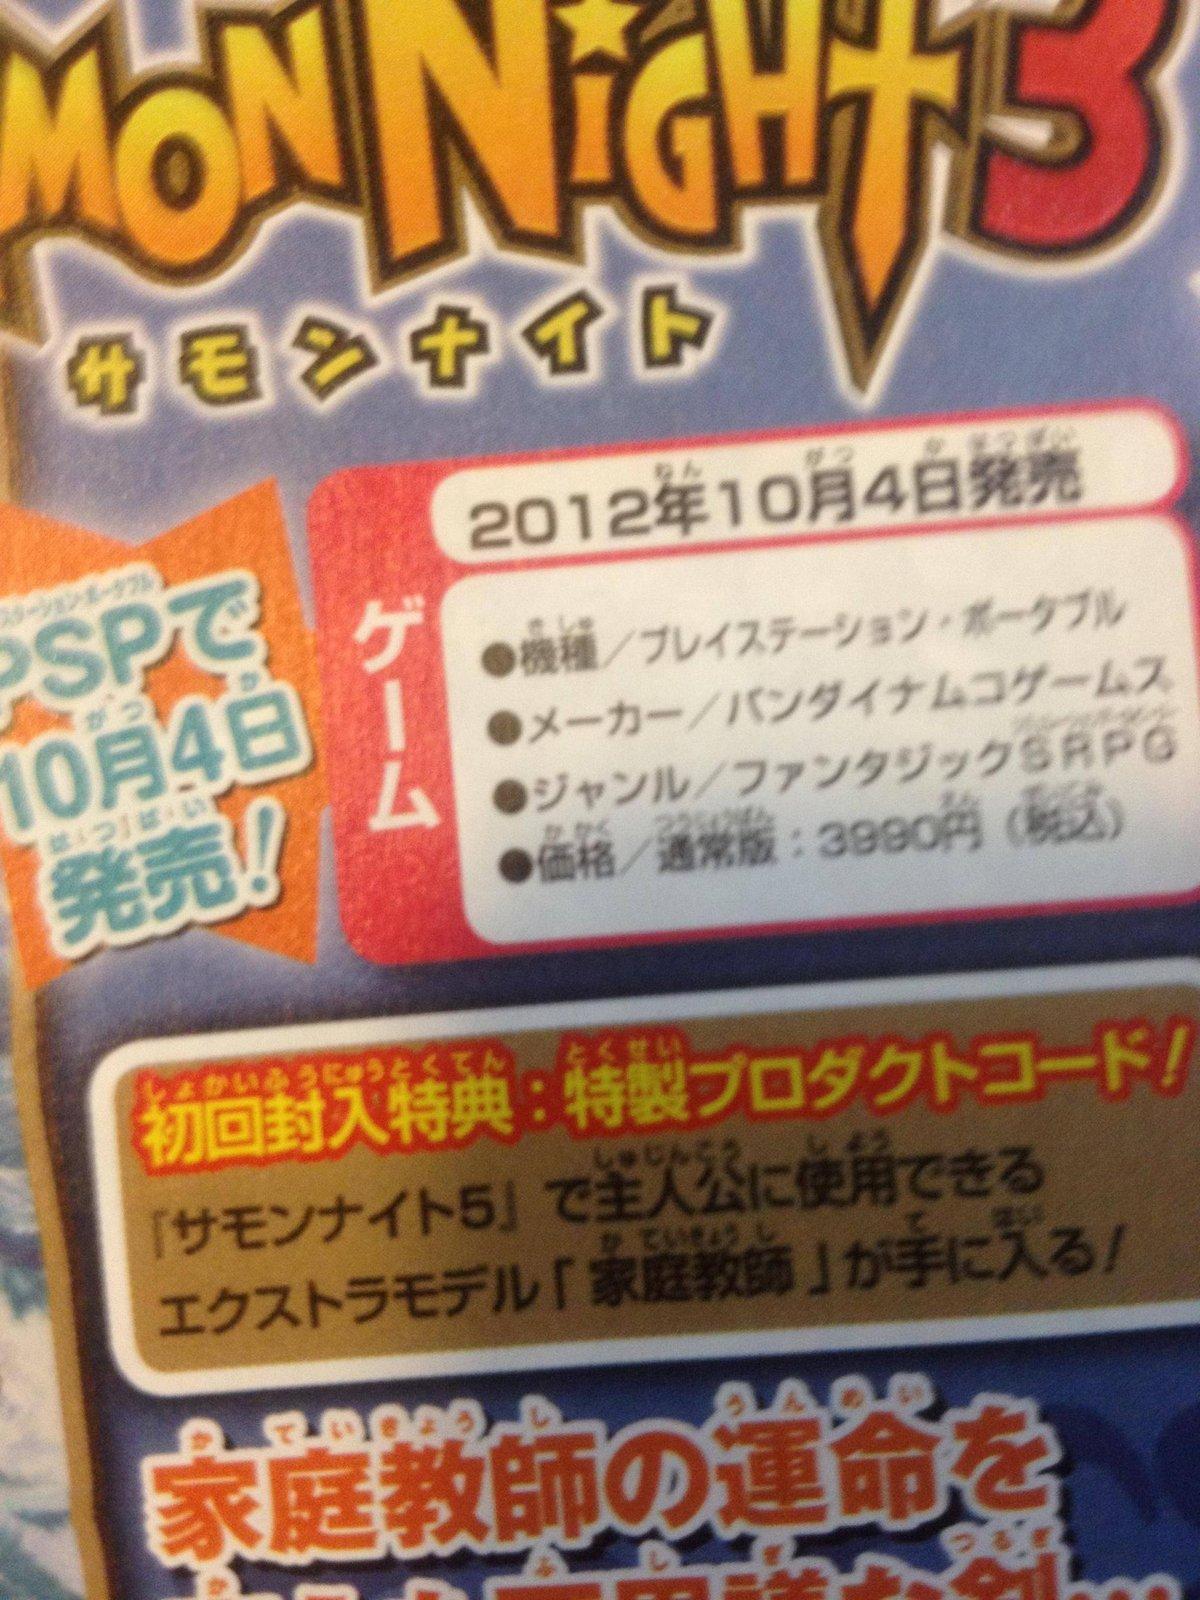 http://blog-imgs-45.fc2.com/a/n/k/ankosokuho/e1c108e2.jpg